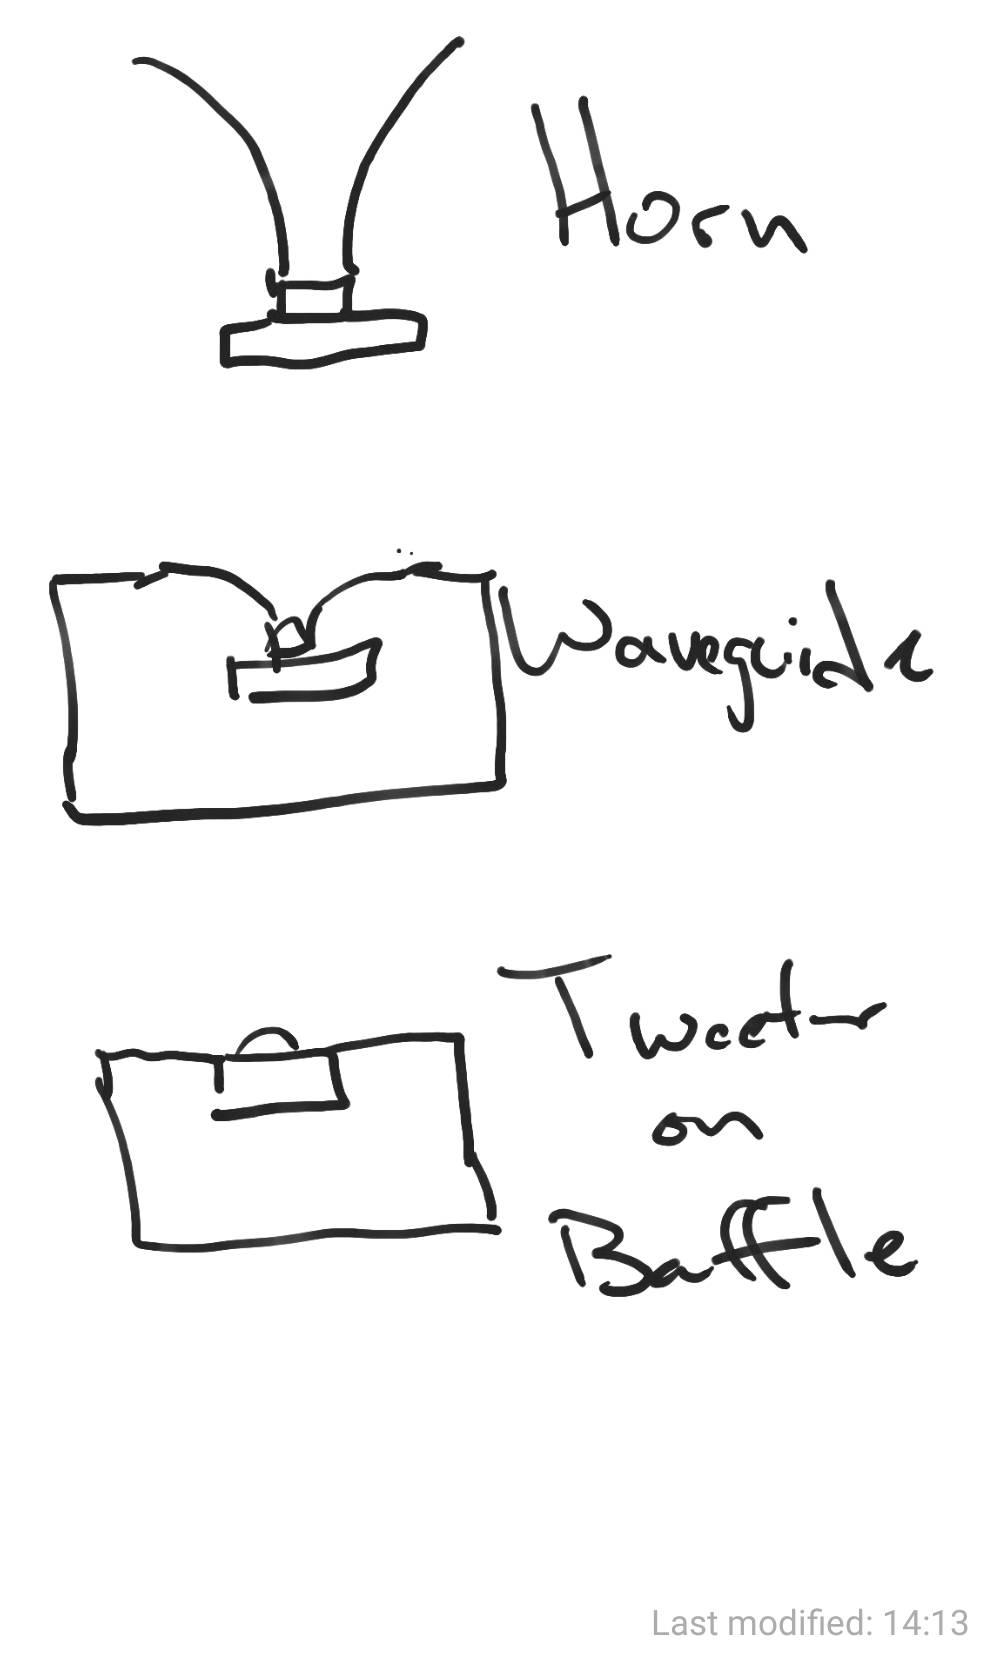 waveguide or horn.jpg